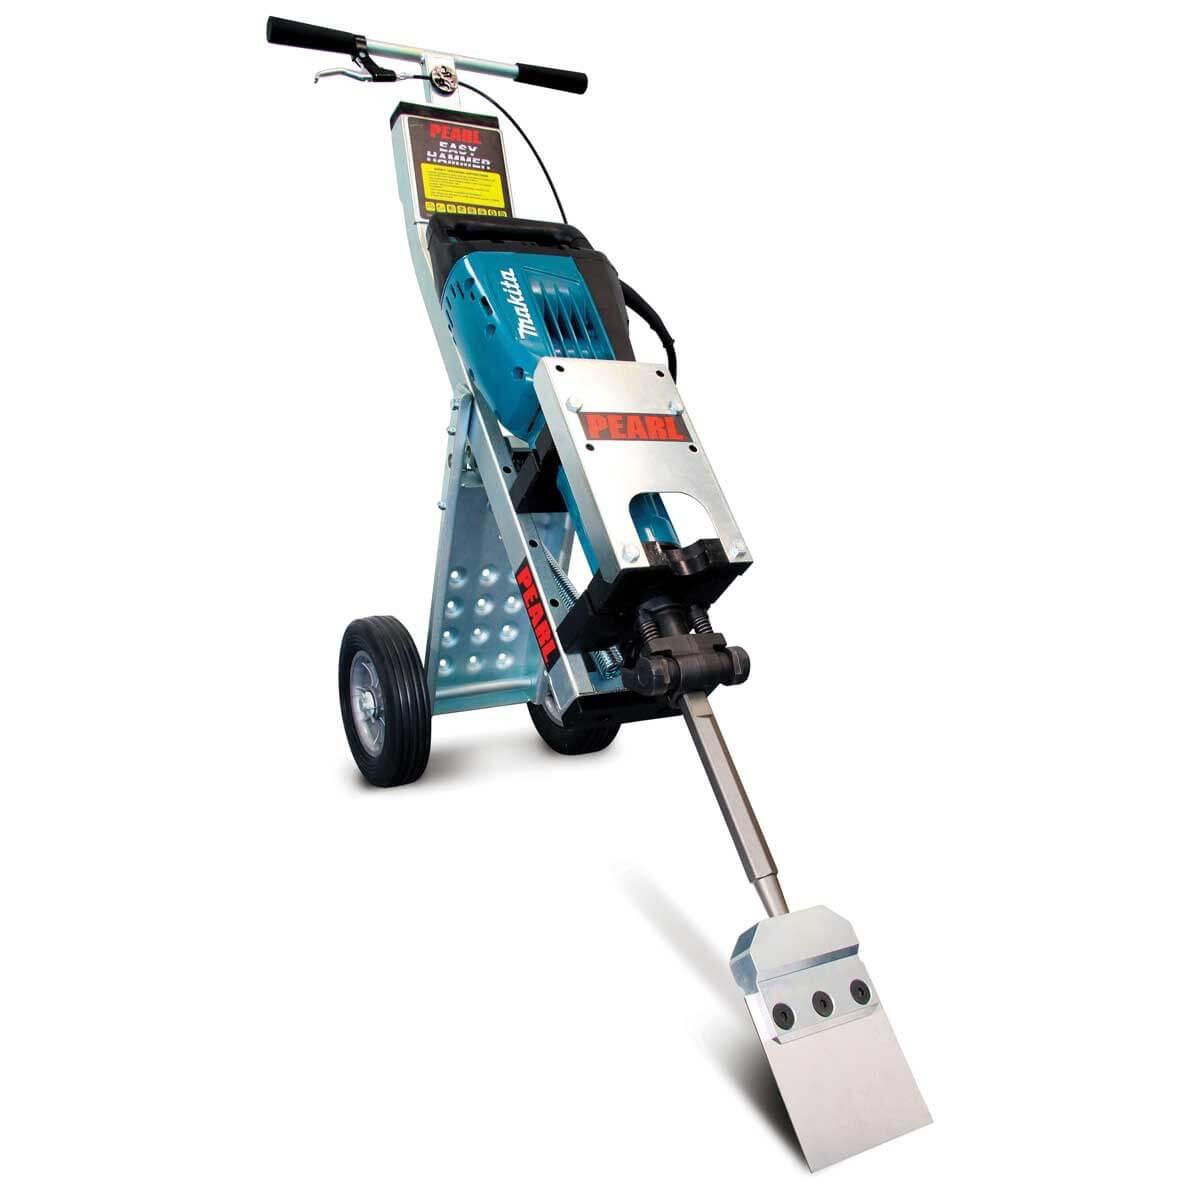 Pearl Easy Hammer Trolley blade